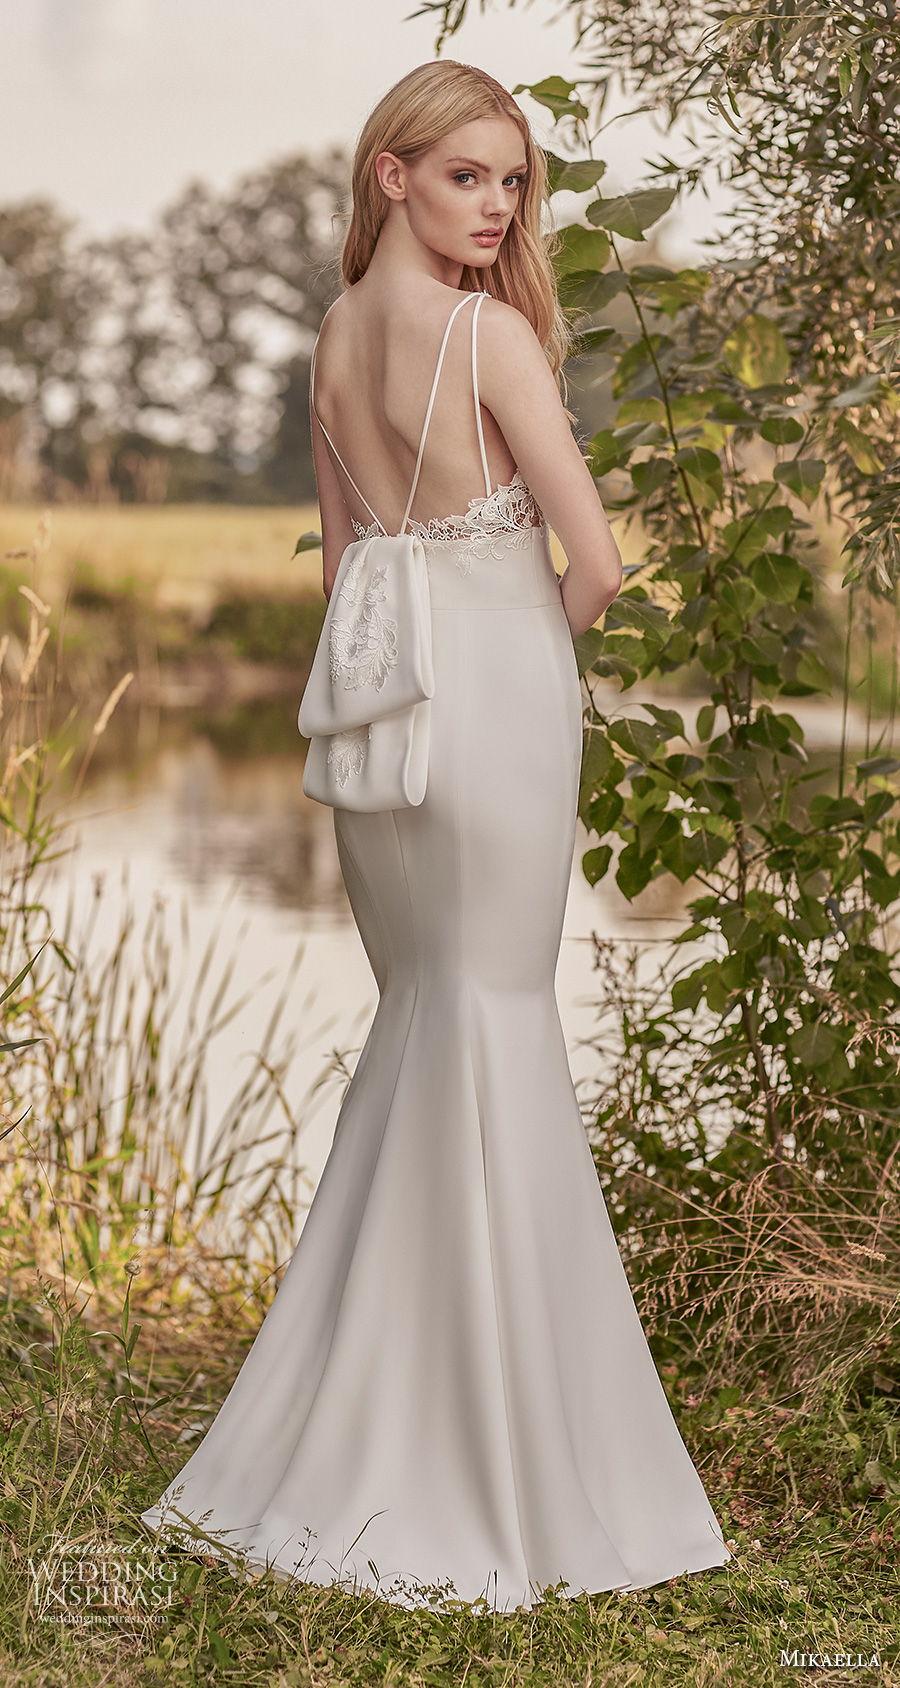 mikaella spring 2020 bridal sleeveless v neck heavily embellished bodice elegant fit and flare wedding dress backless v back sweep train (3) bv